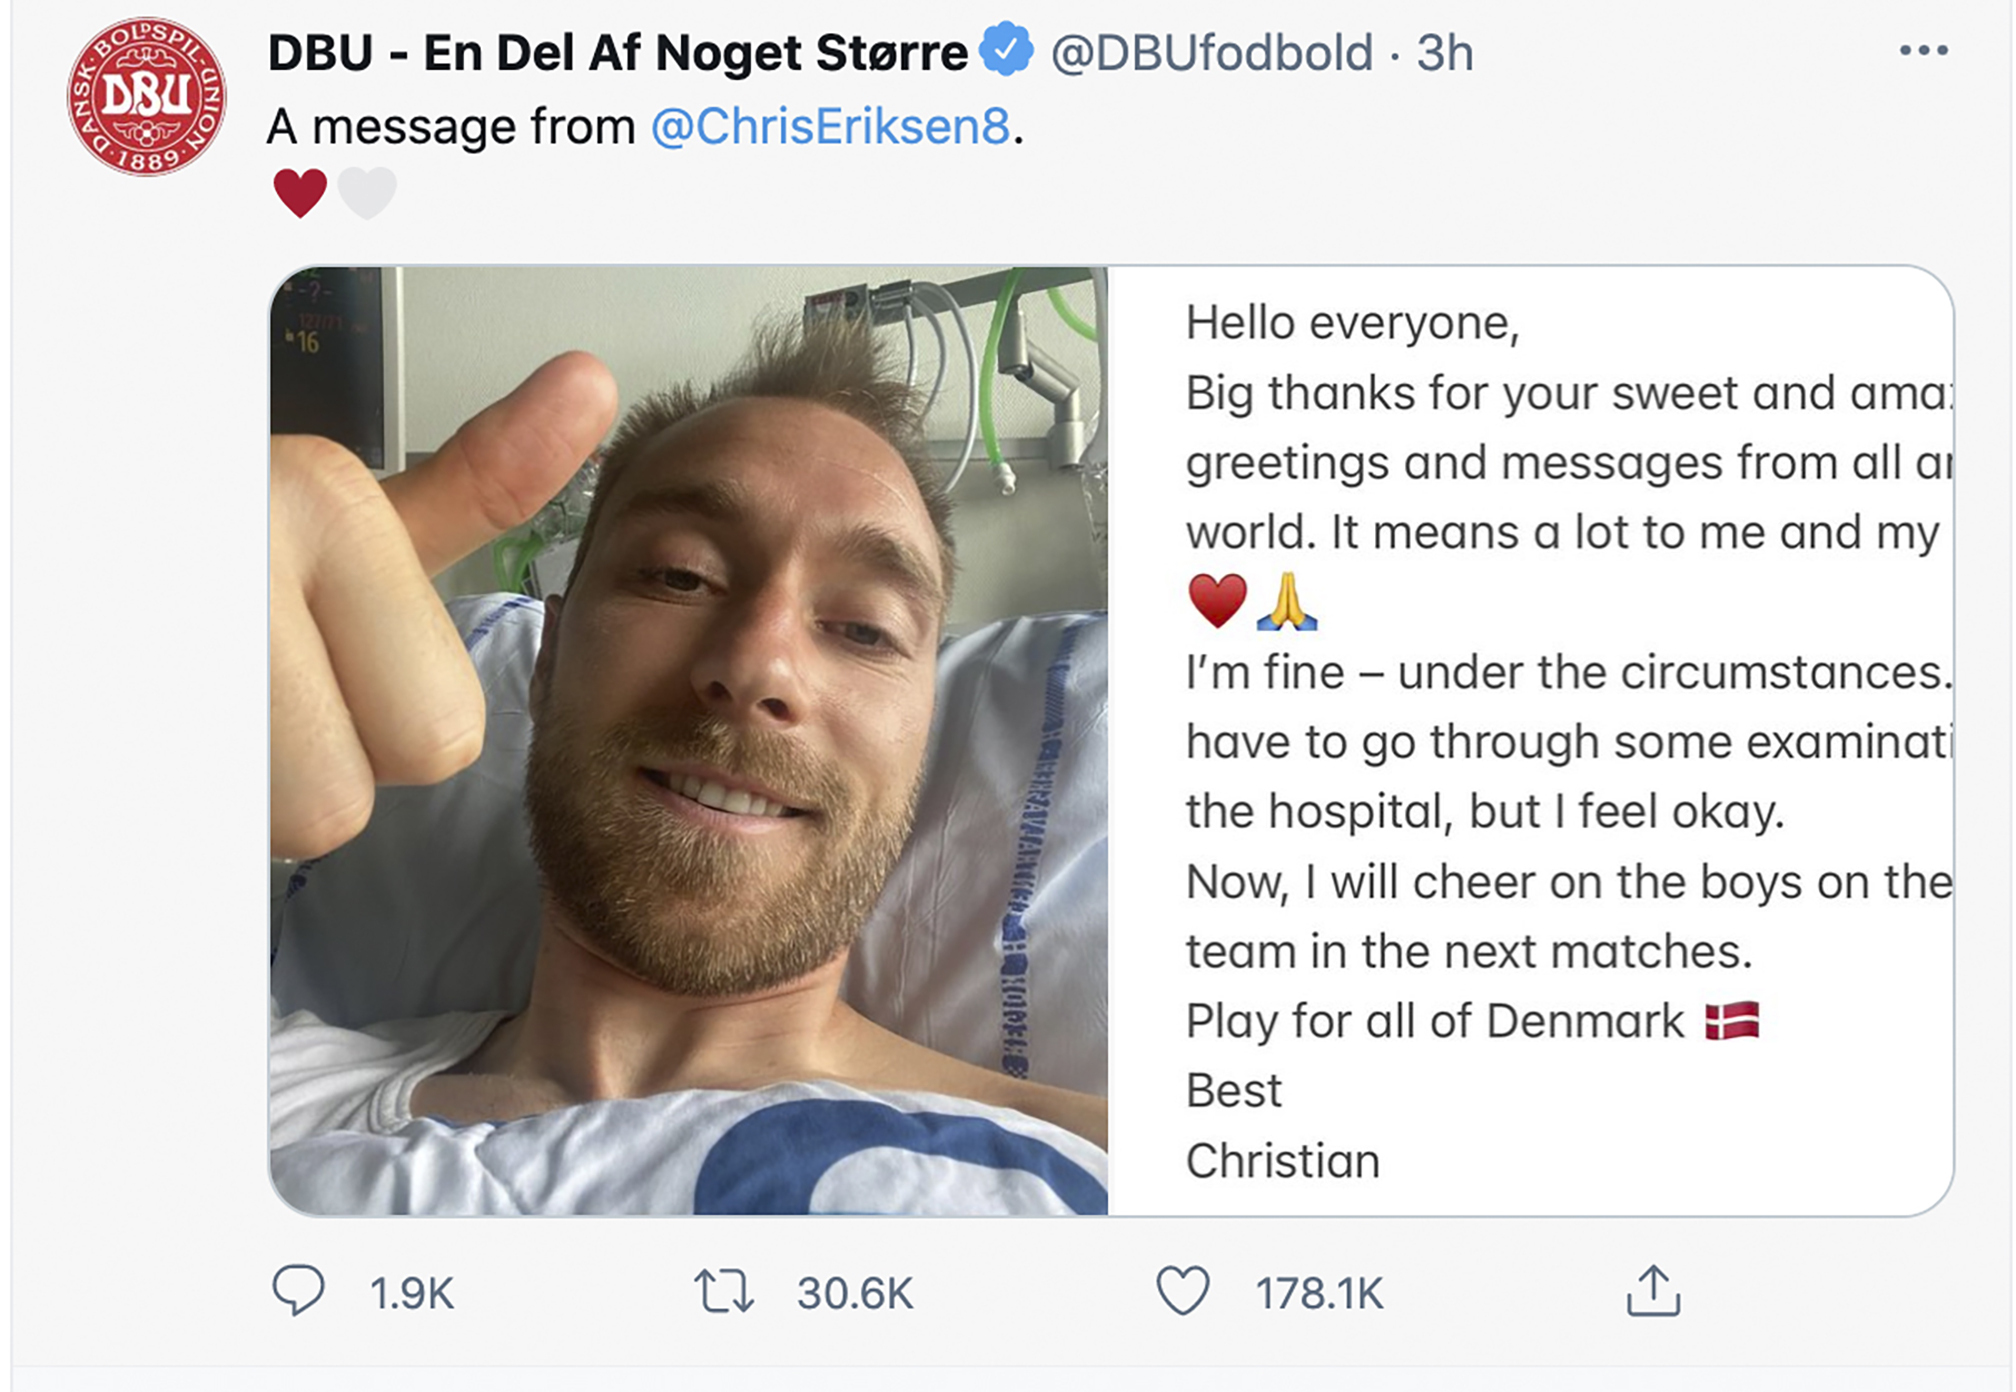 Denmark soccer player Christian Eriksen gesturing from his hospital bed.